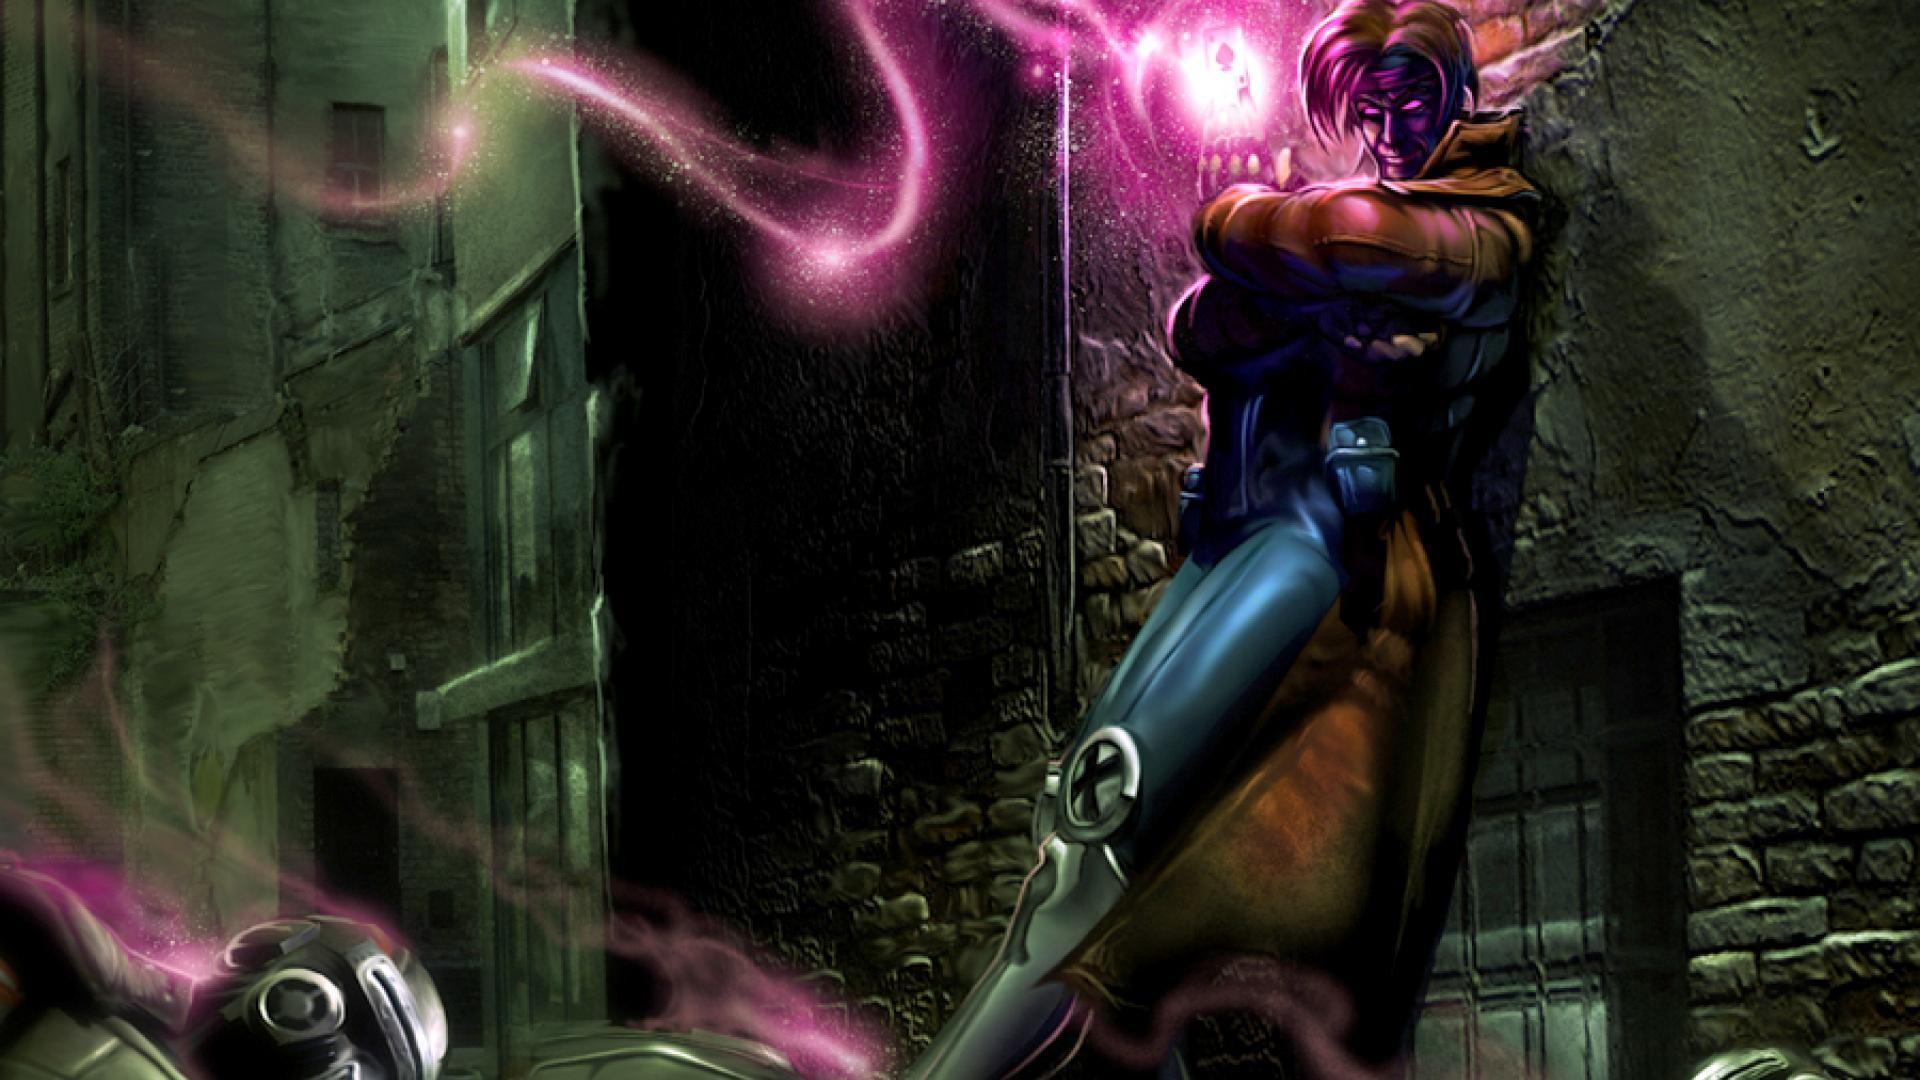 XMen Origins Wolverine images Gambit HD wallpaper and